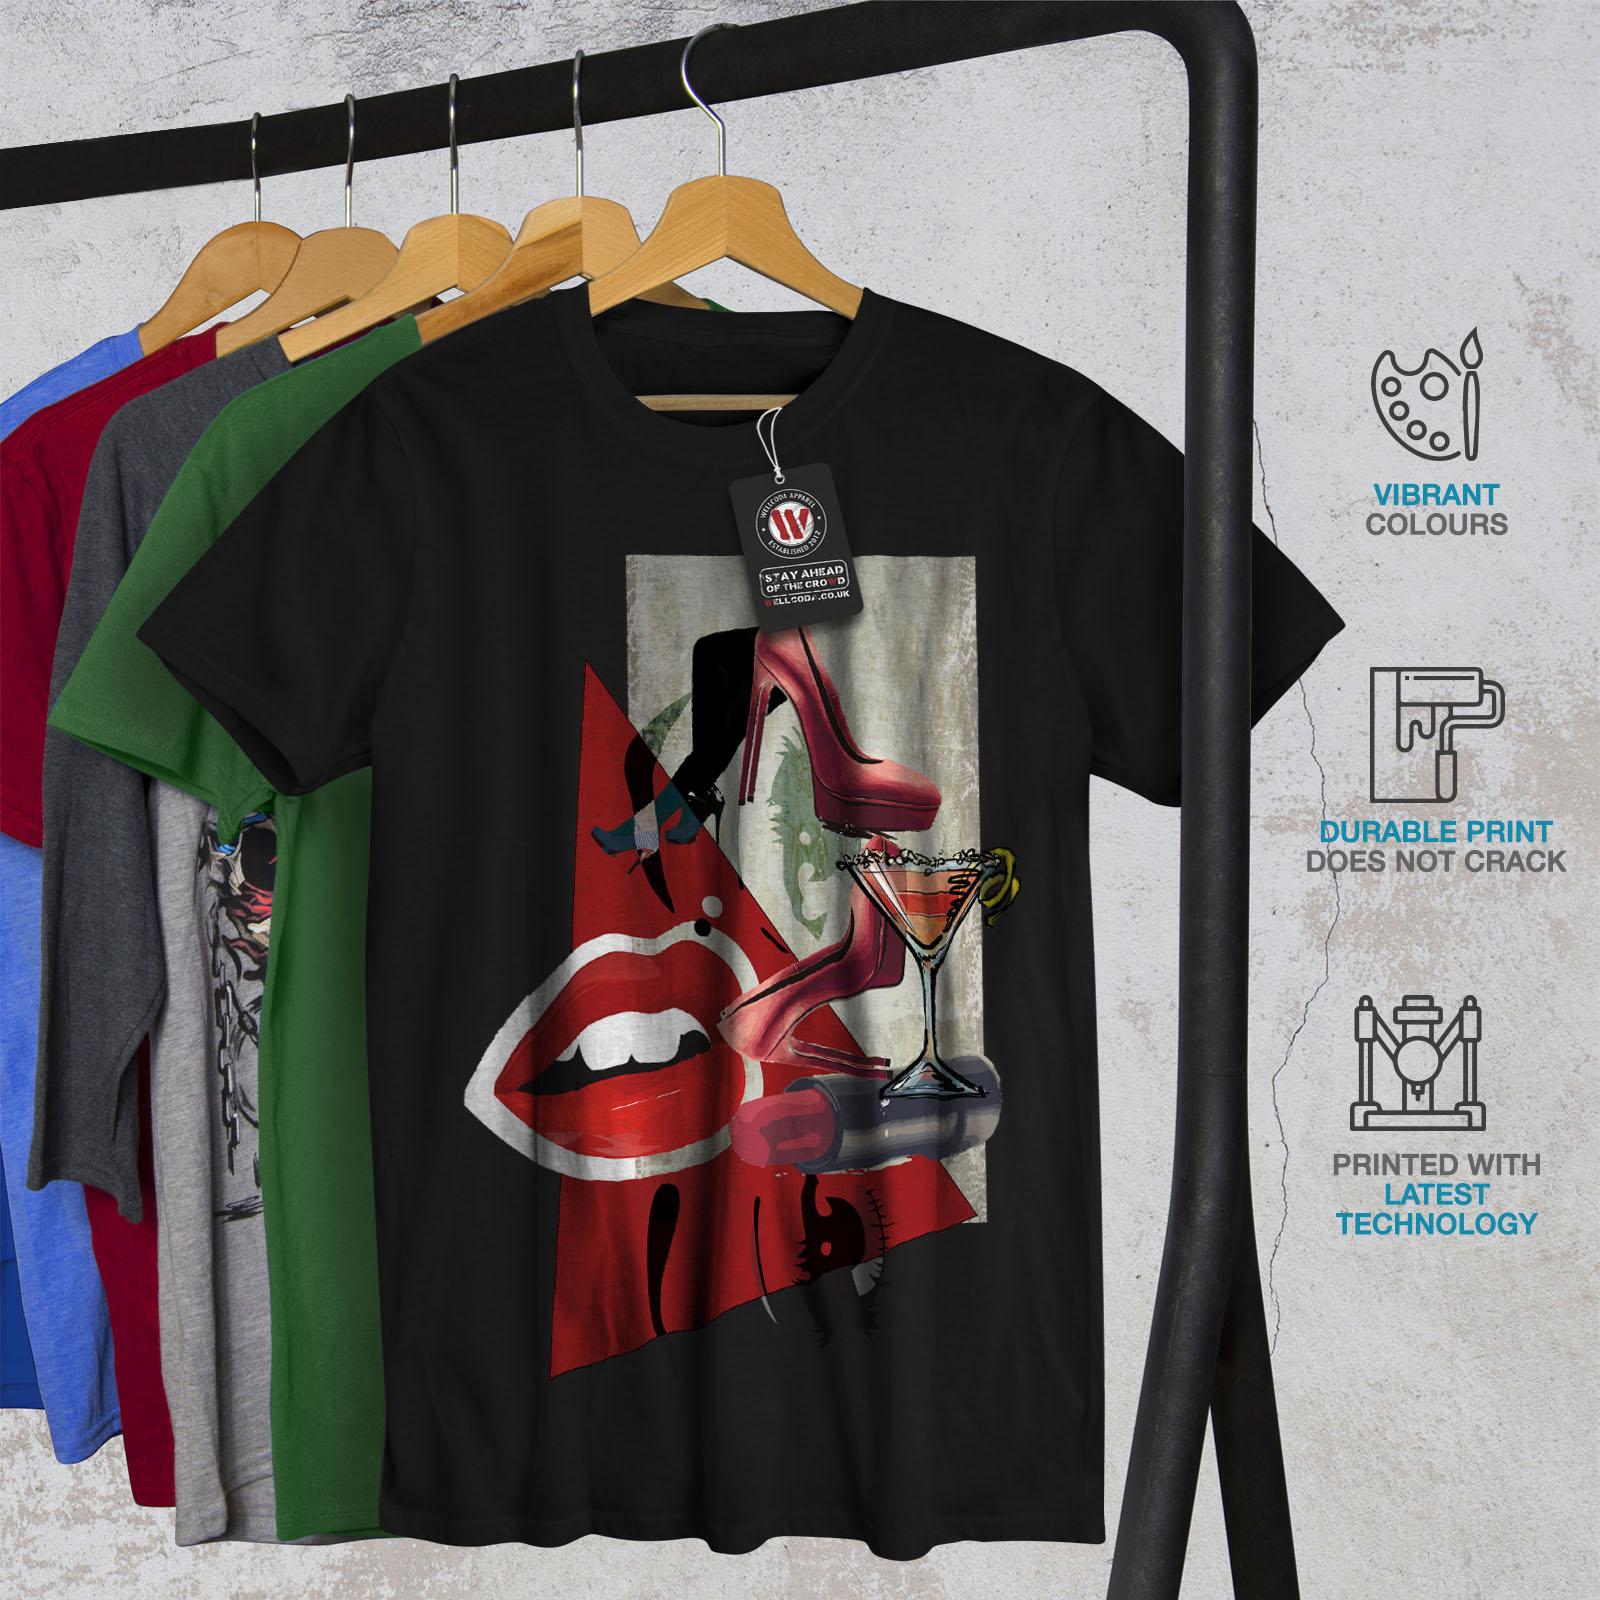 Glamour Graphic Design Printed Tee Wellcoda Lady Stylish Fashion Mens T-shirt